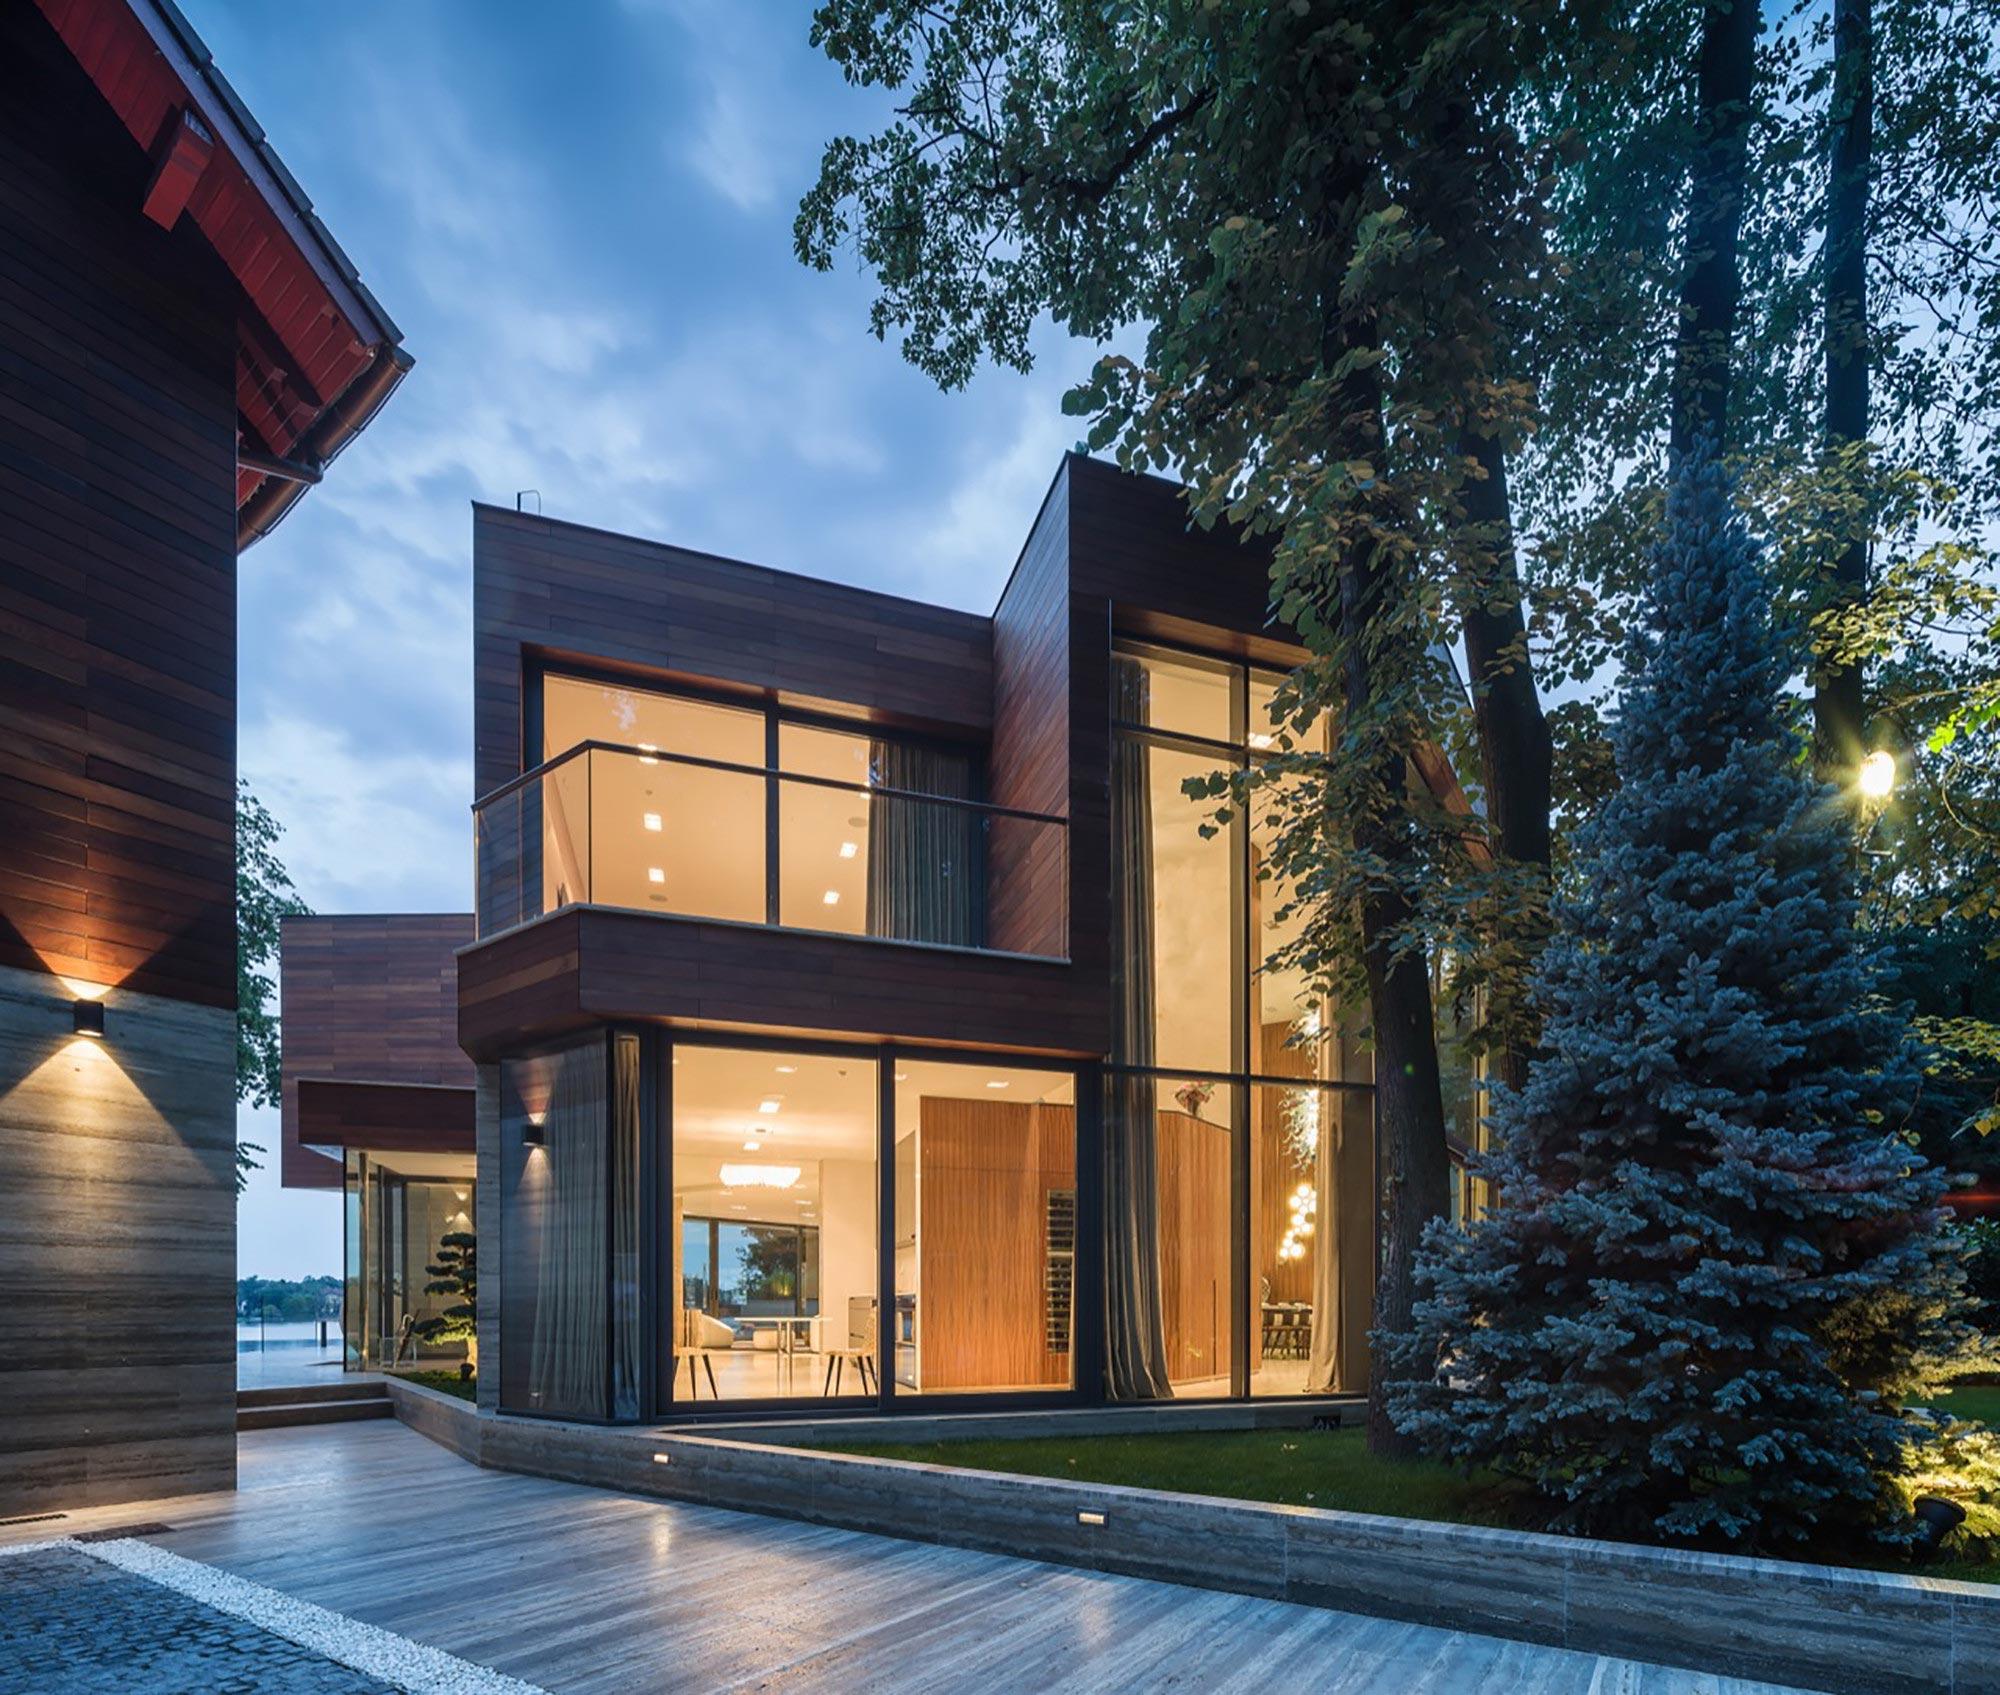 Modern Lake House Design: On The Shores Of Lake Snagov By DOOI Studio